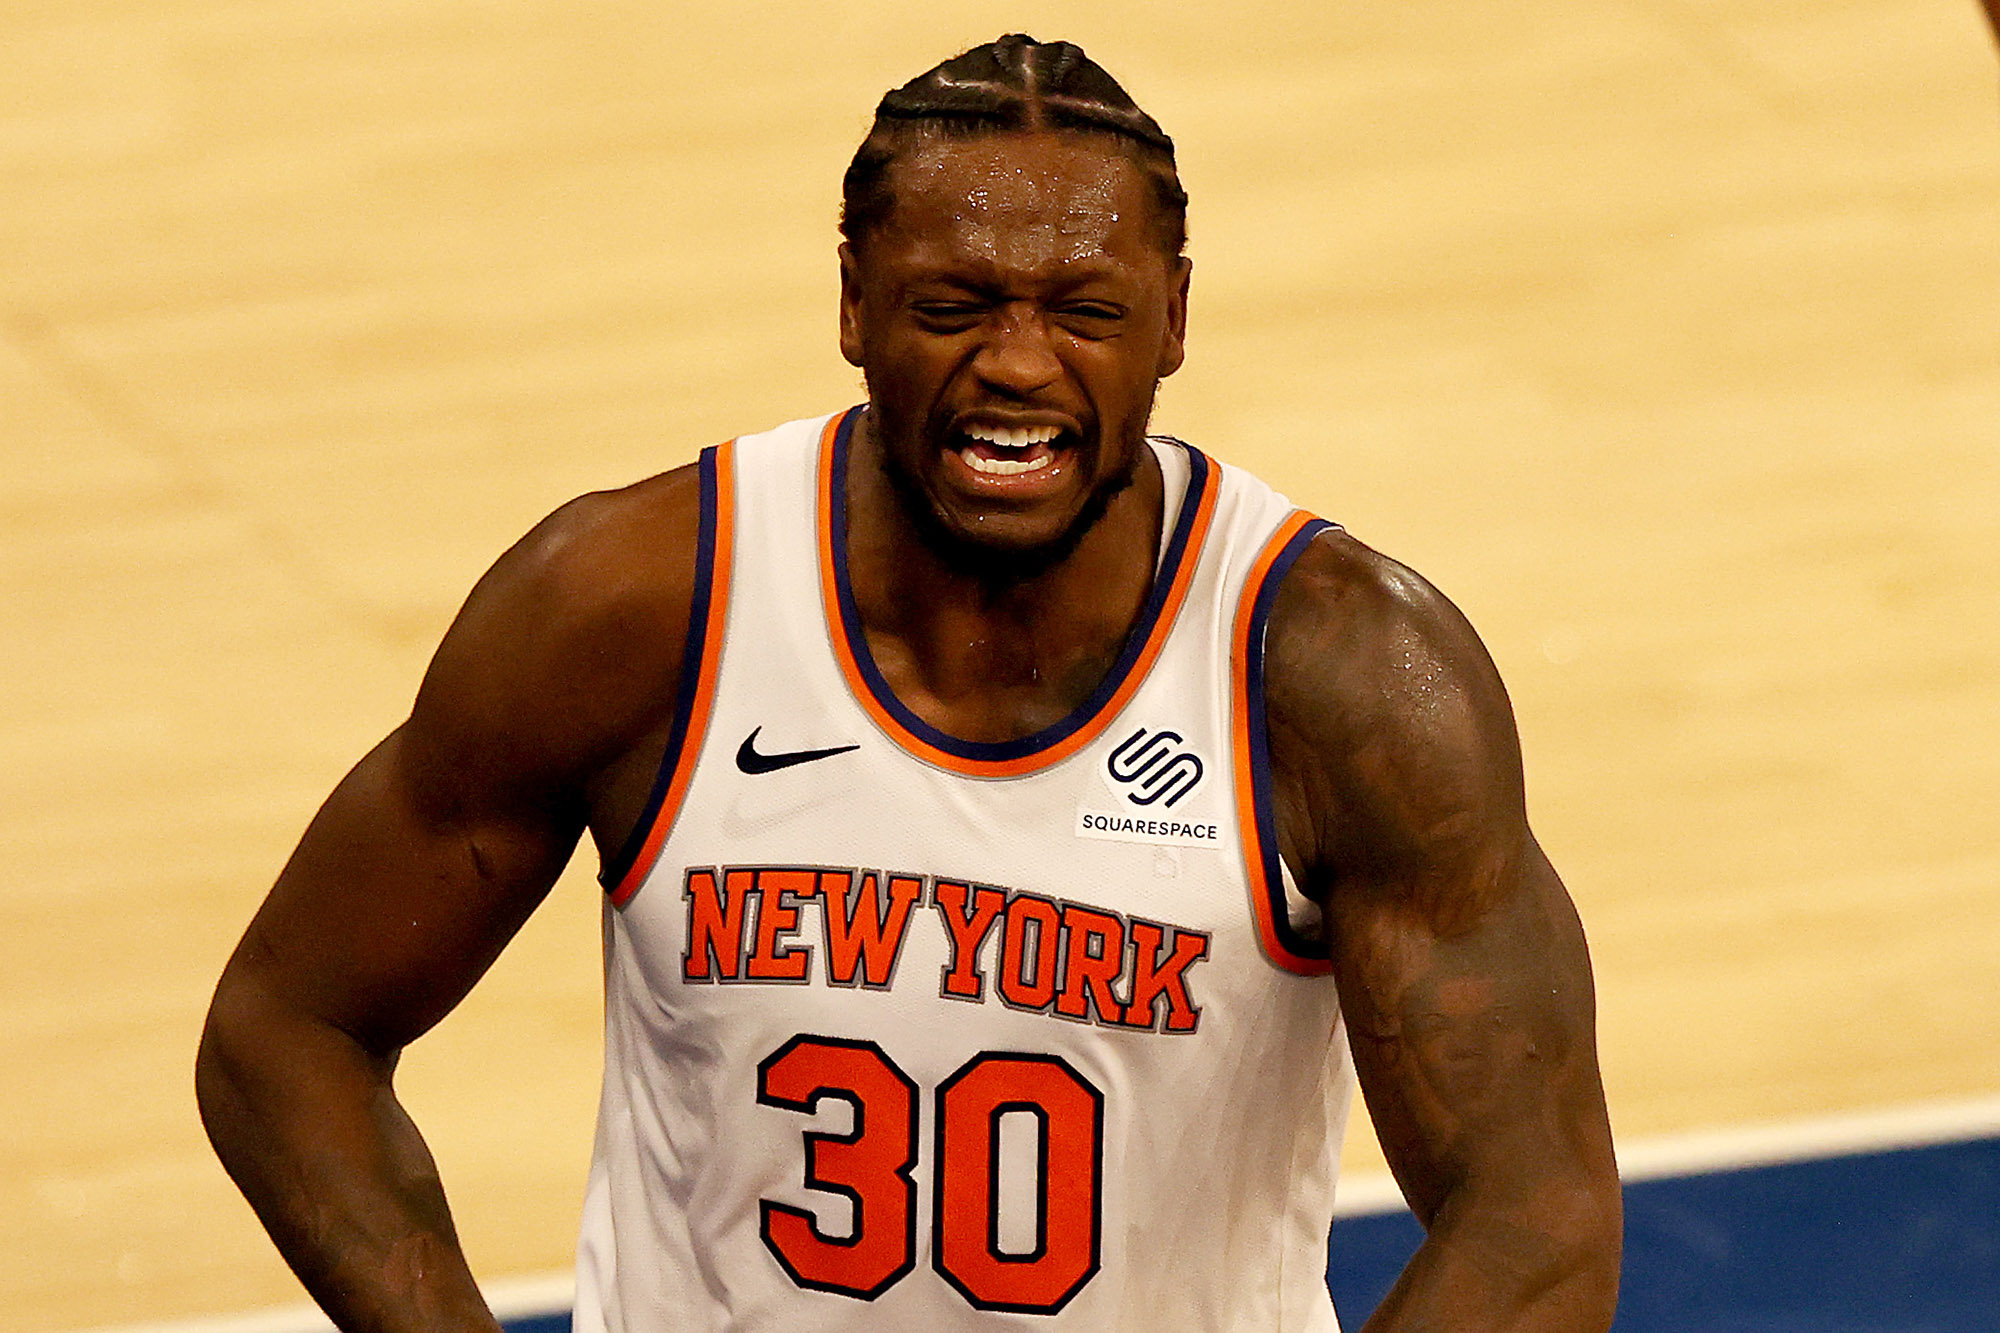 NBA playoffs: Knicks' Julius Randle will wear hair in braids